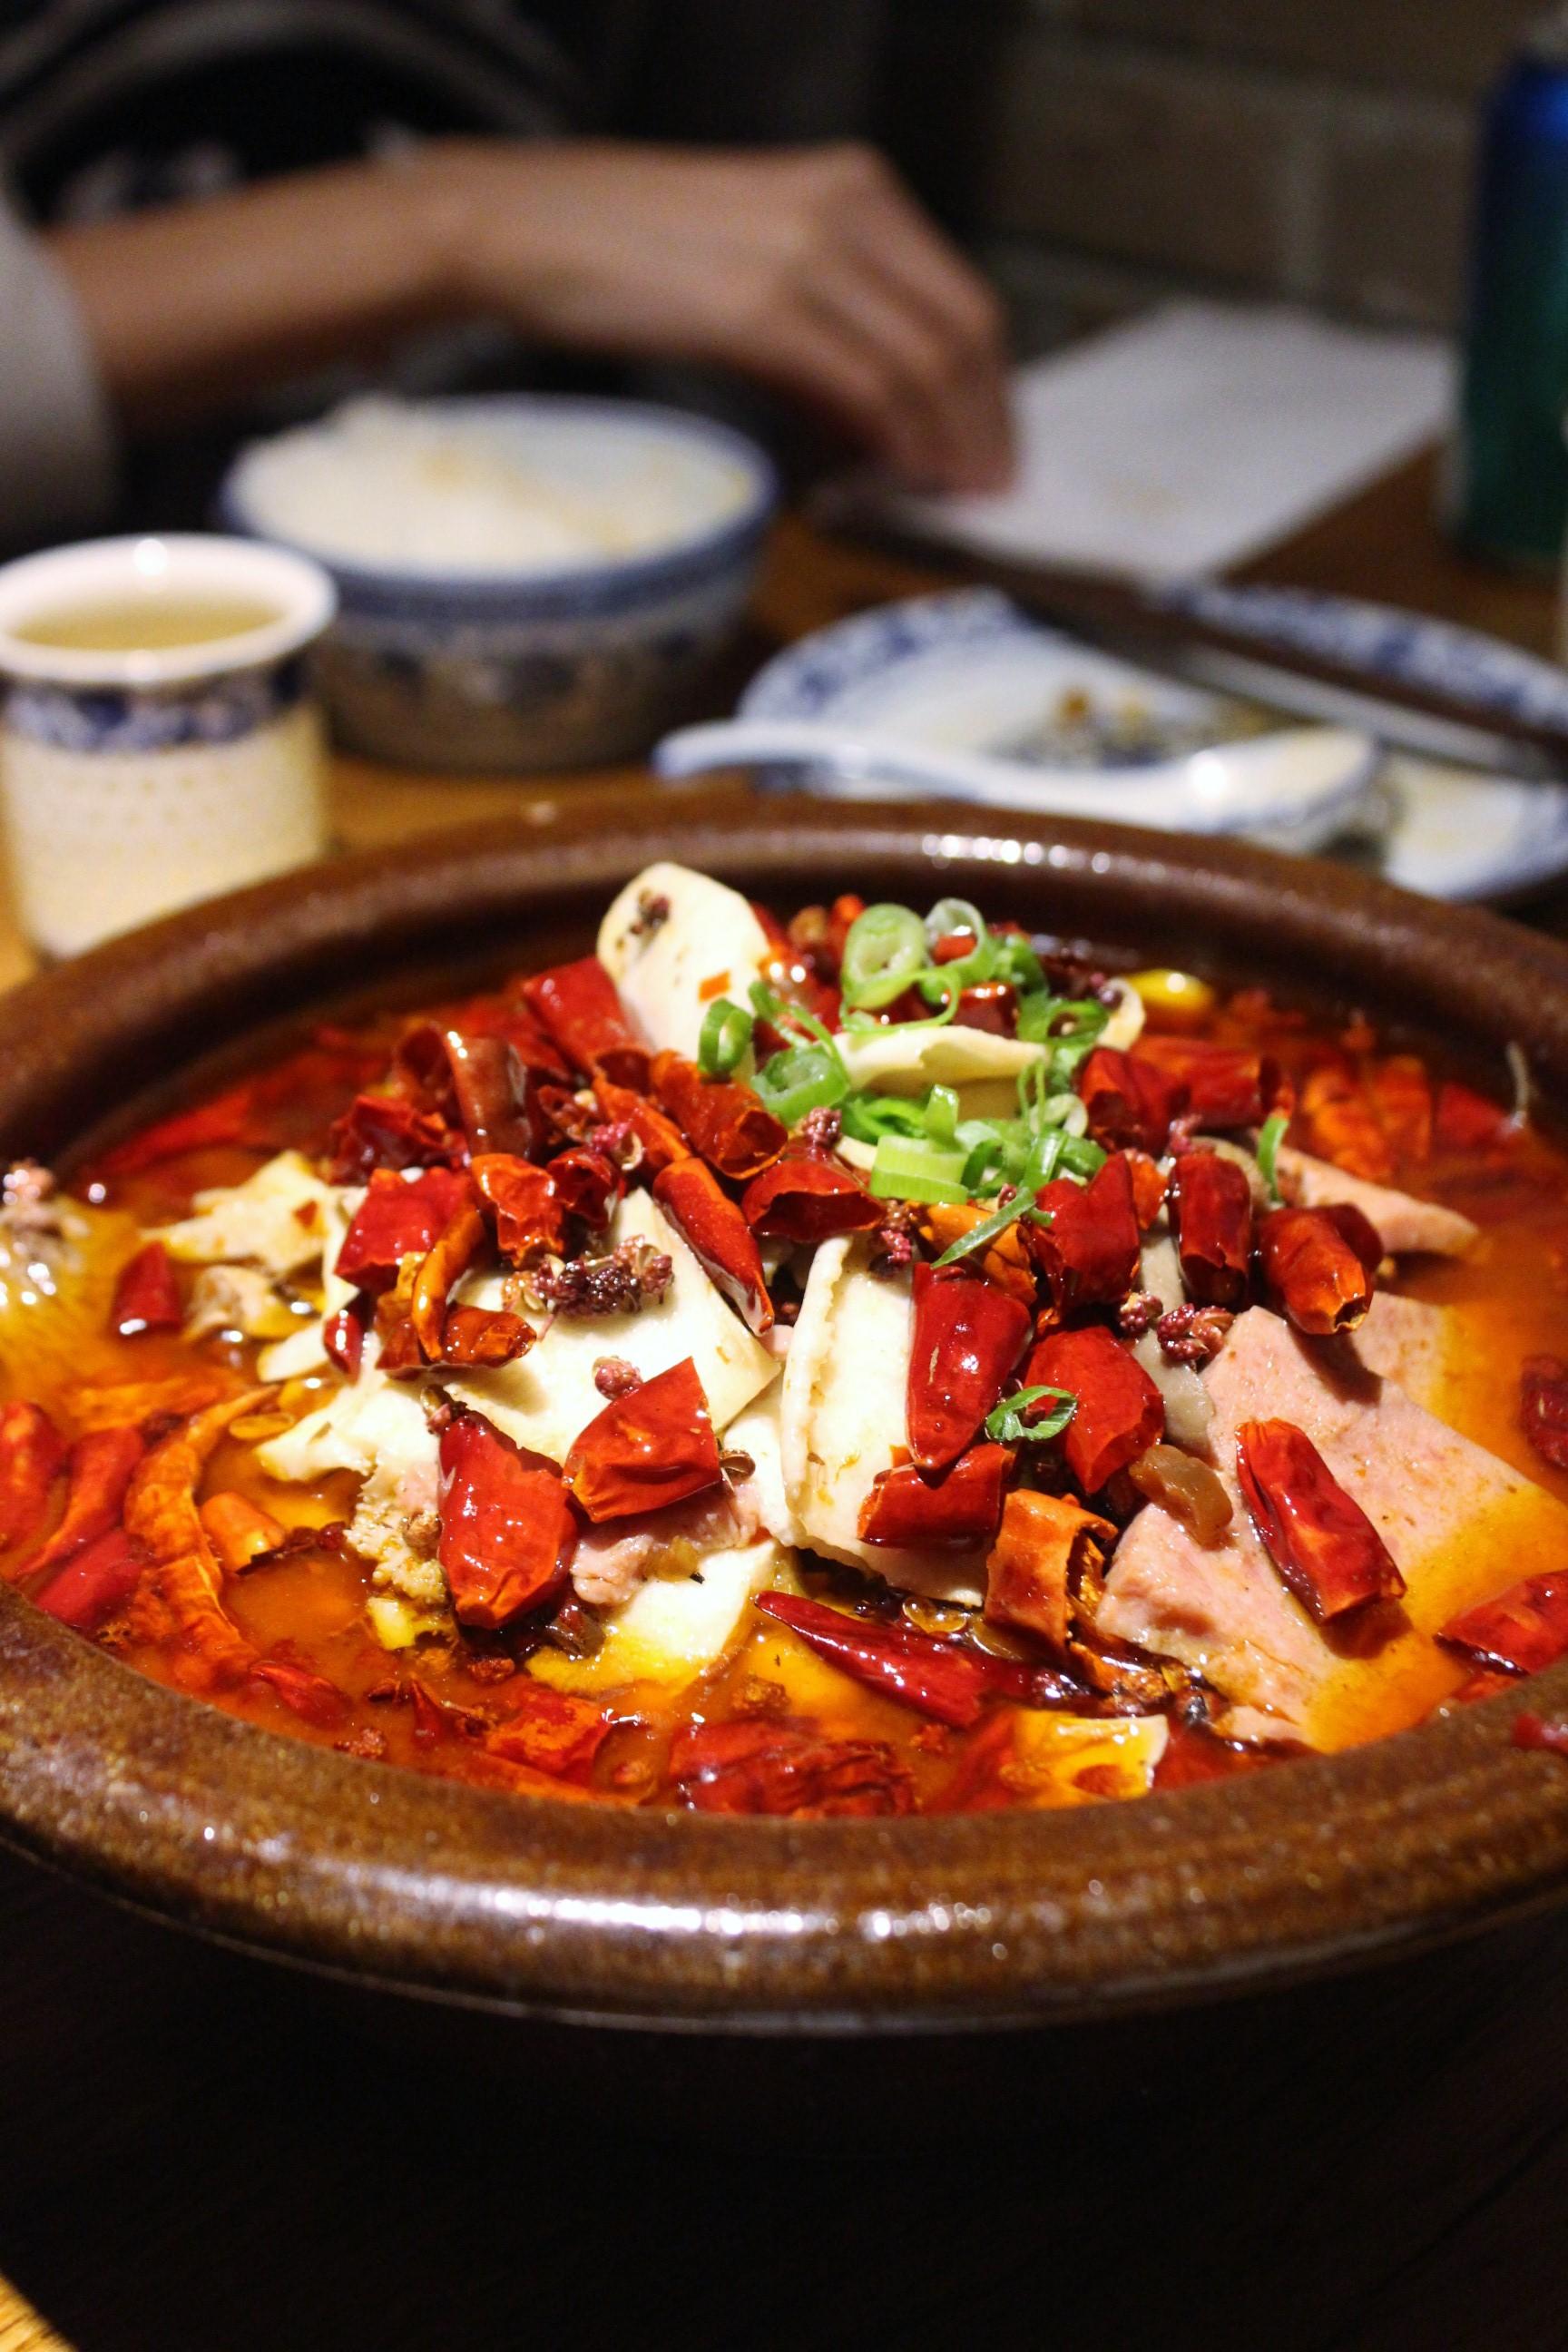 Tilapia Stew with Chili at Szechuan Mountain House